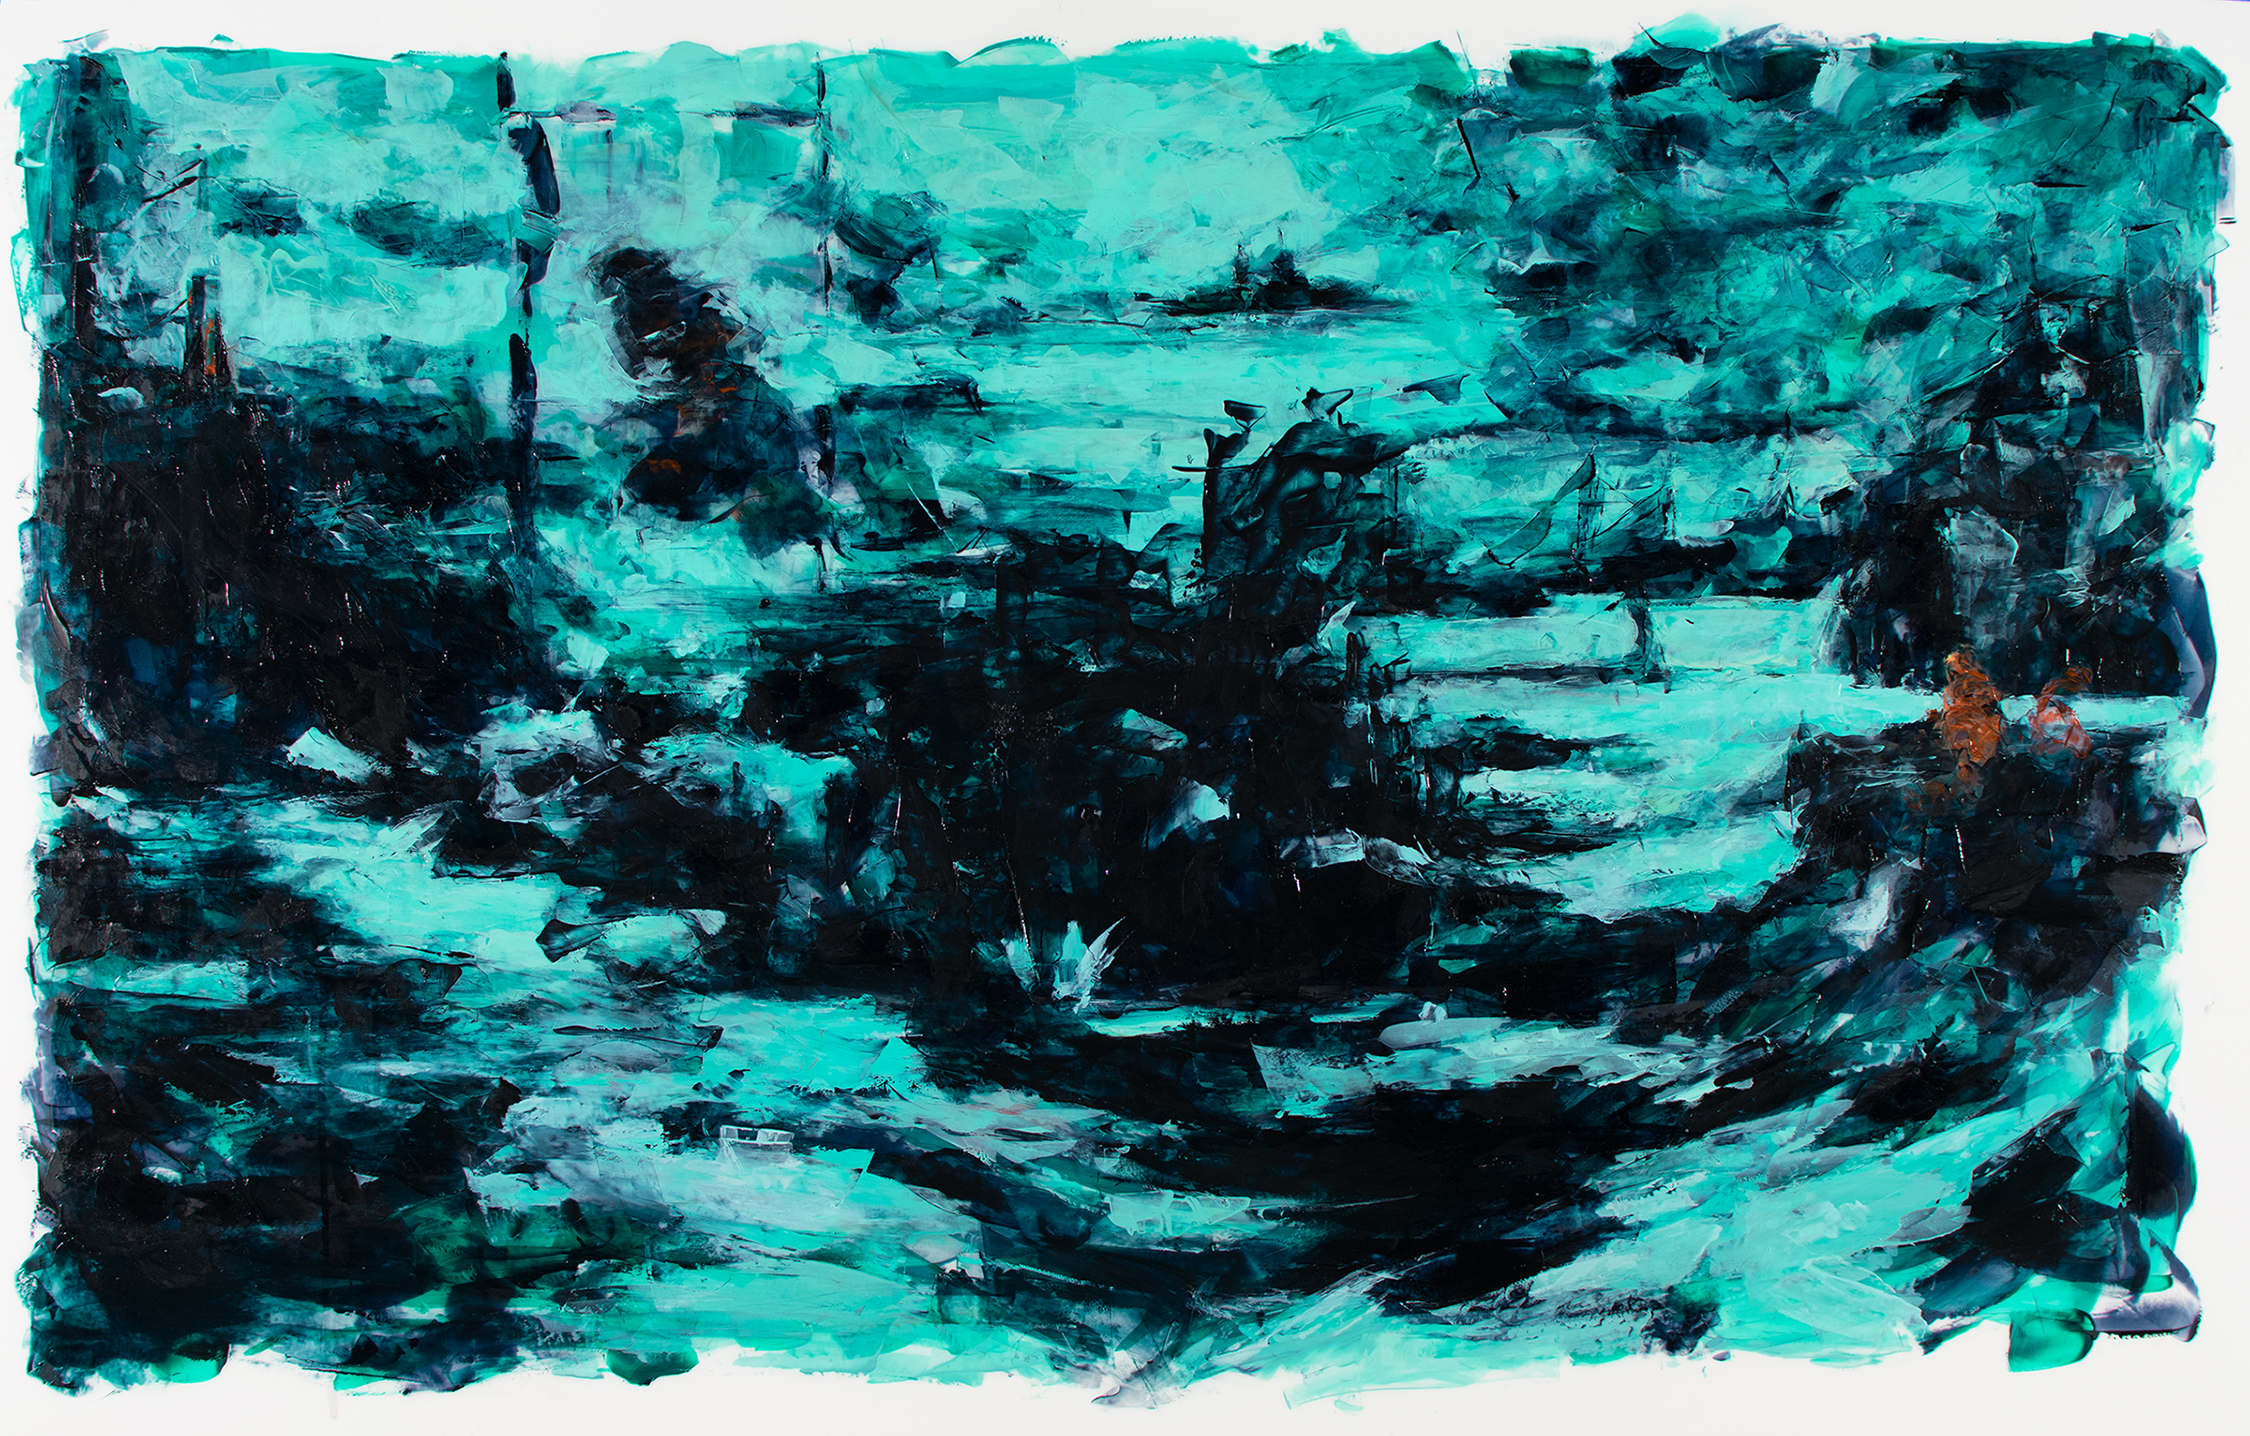 "'Ghosts of Svörtuloft', oil and acrylic on Mylar, 25"" x 40"", 2016"